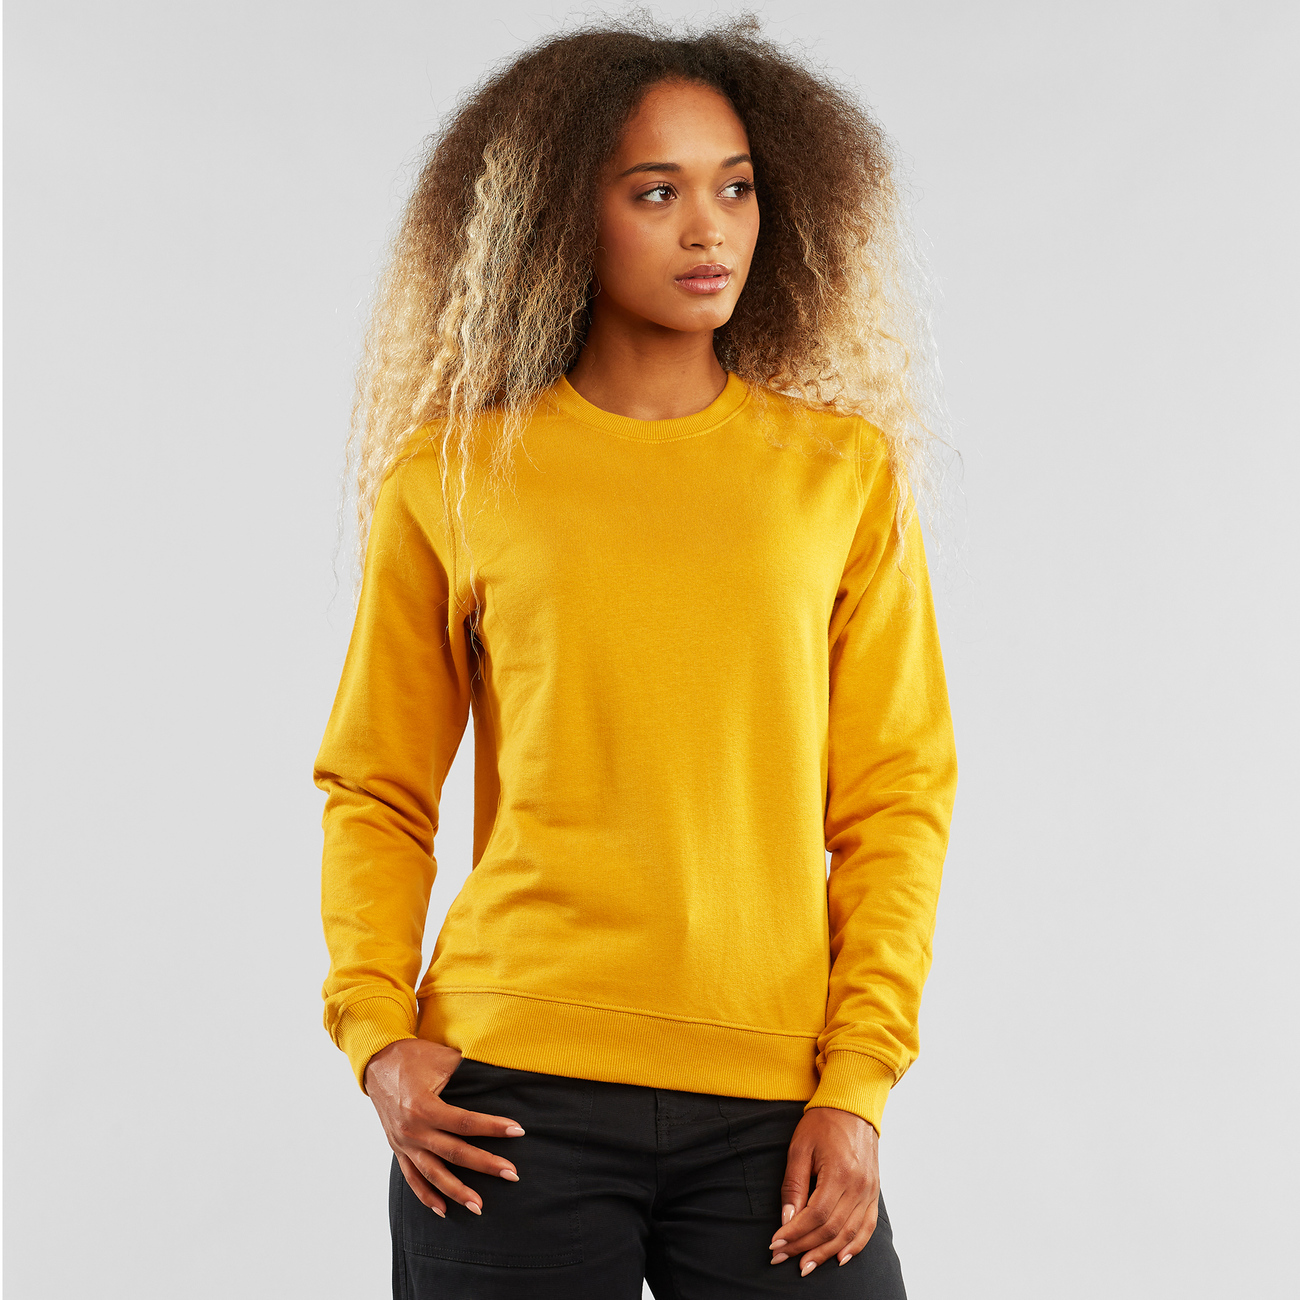 Sweatshirt Ystad Base Mustard